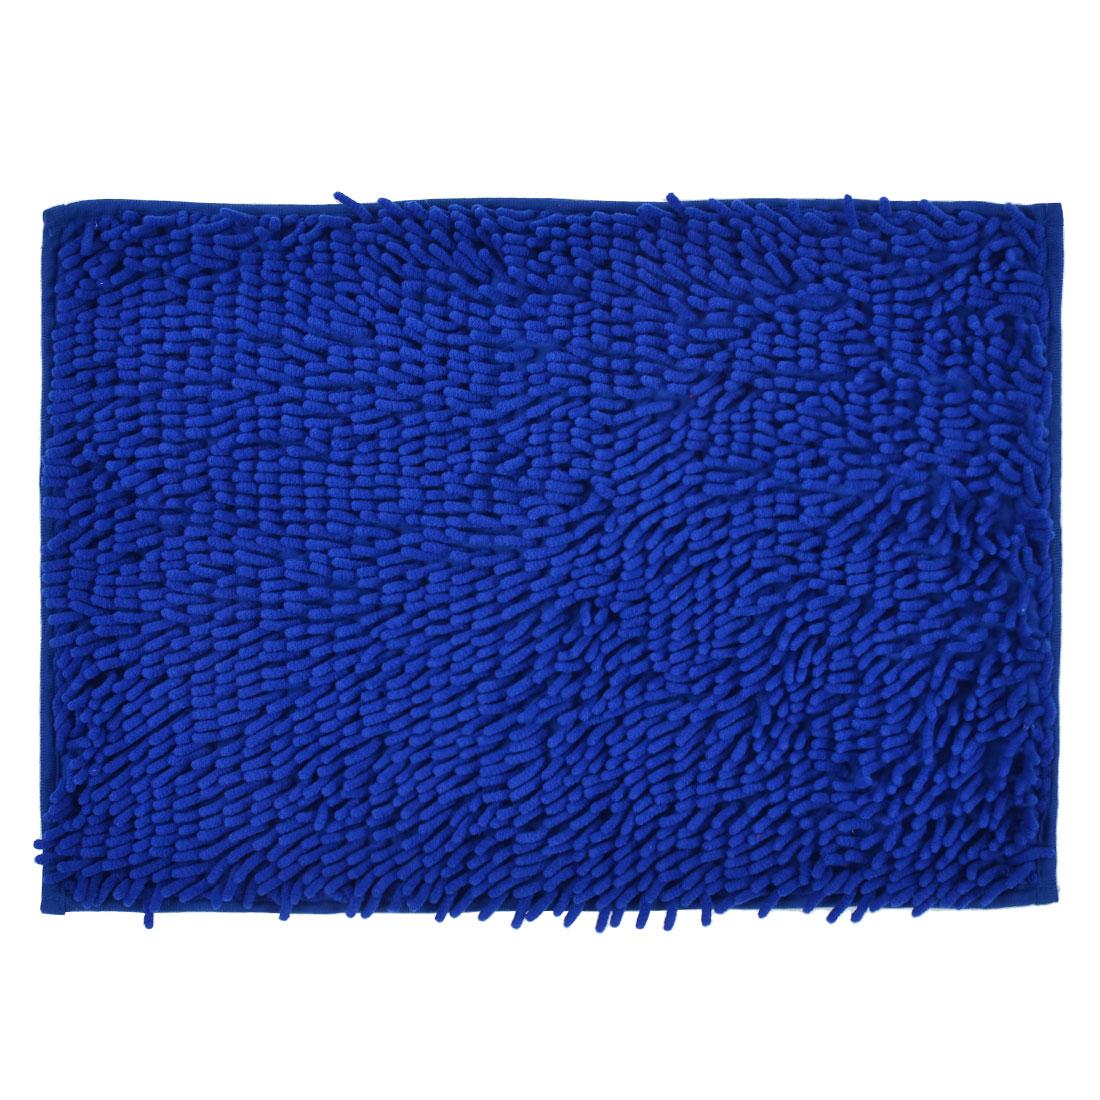 60cm x 40cm Dark Blue Polyester Absorbent Slip-resistant Pad Bath Mat Shower Rug